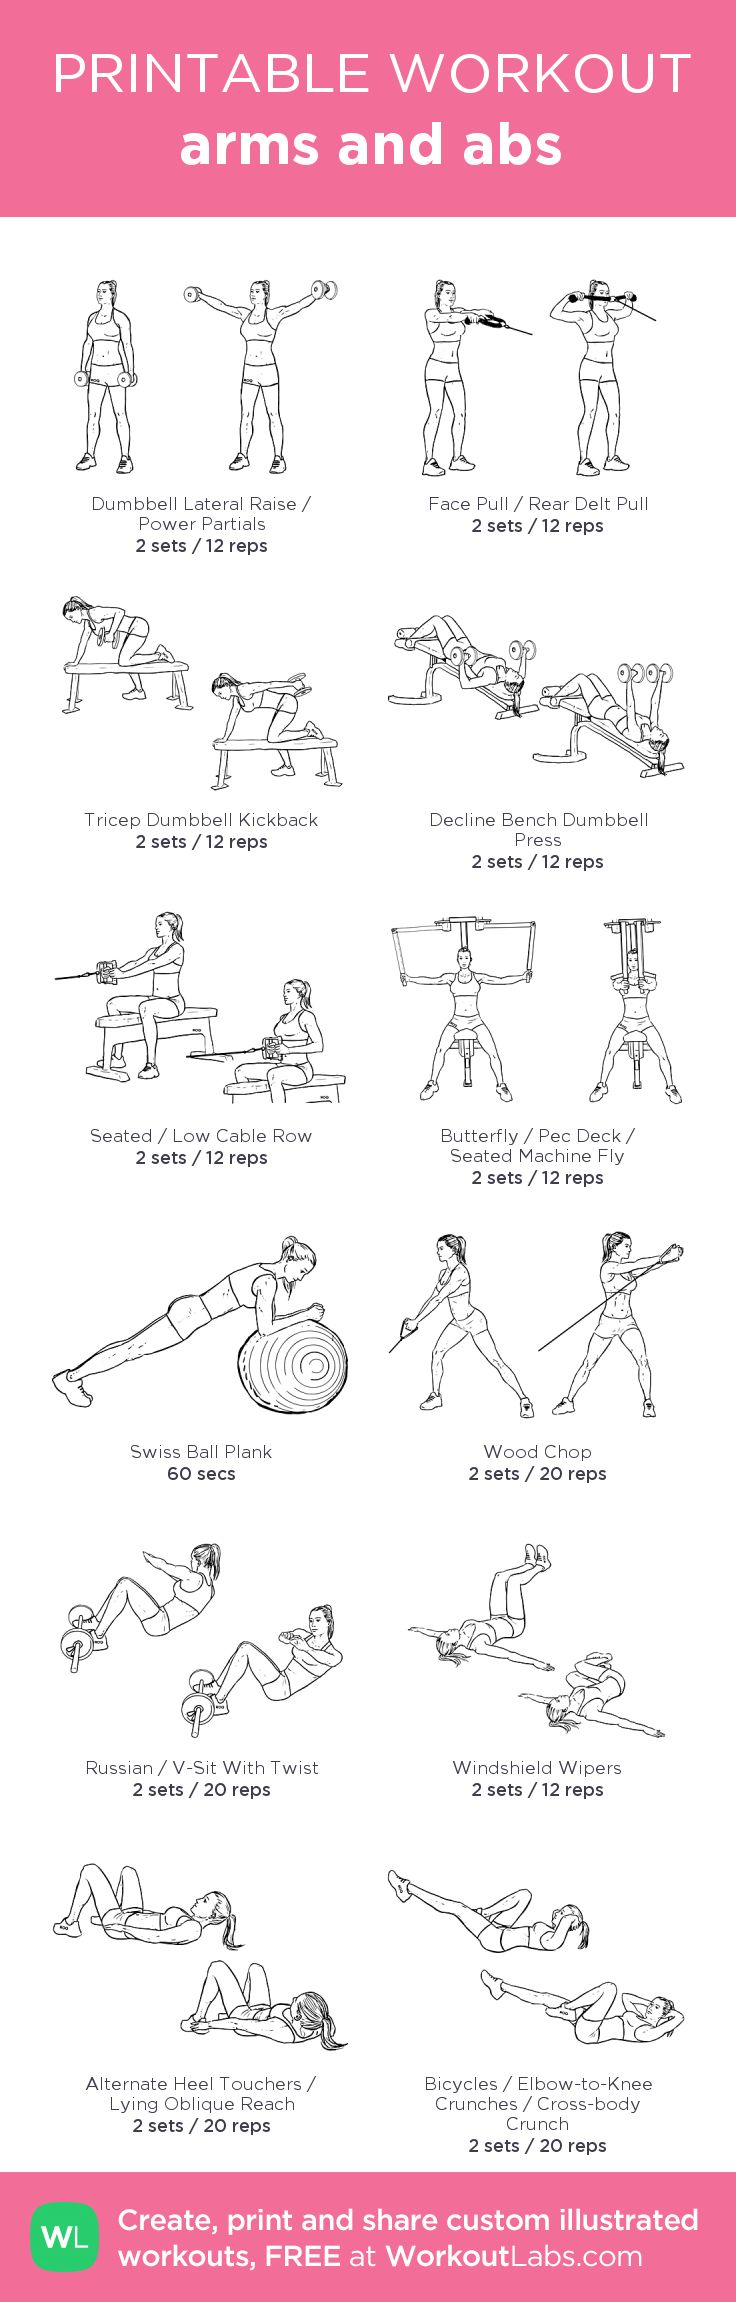 Best 25+ Planet fitness workout ideas on Pinterest | Entraînement ...